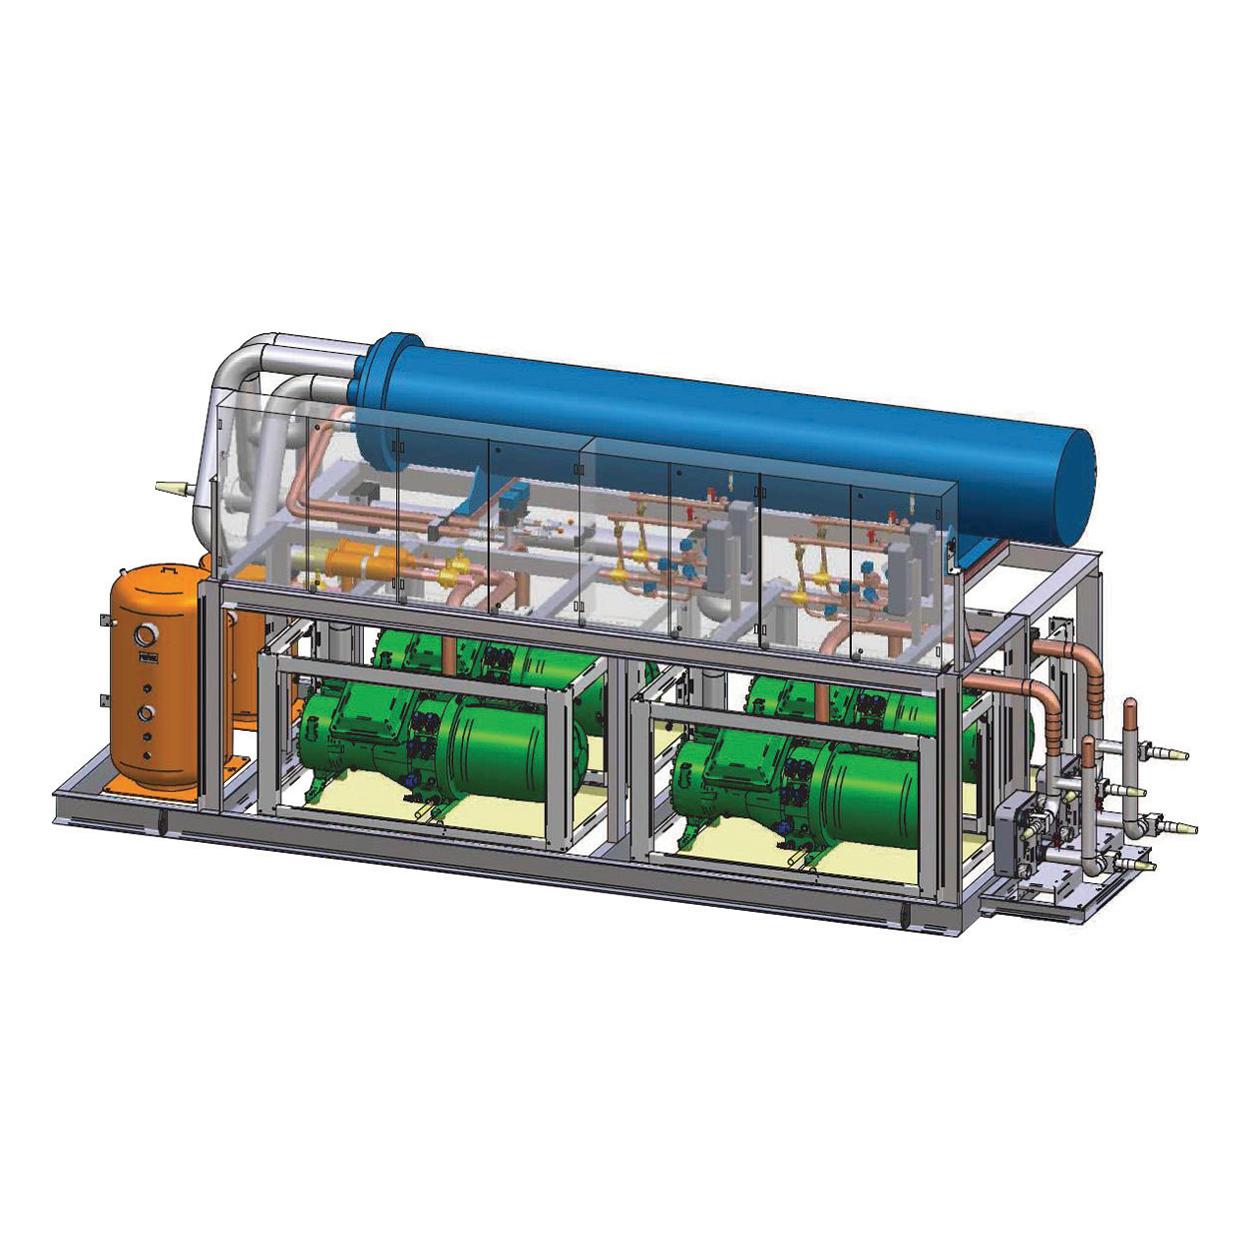 Profroid-Chiller-compressor-rack-condensing-unit